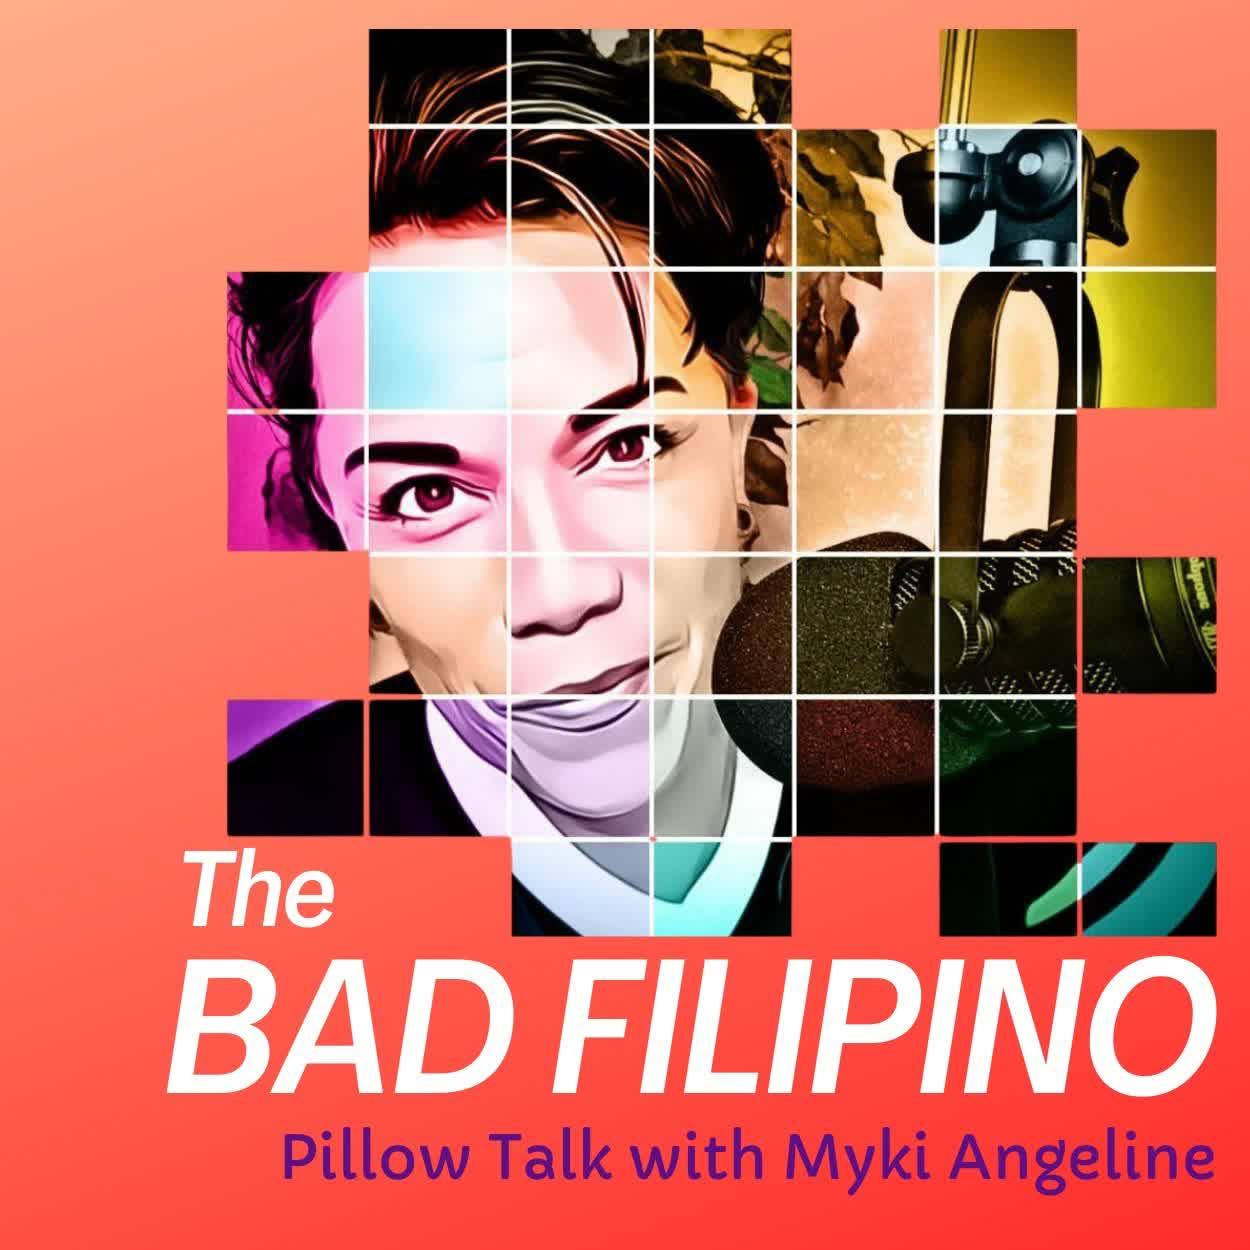 The Bad Filipino